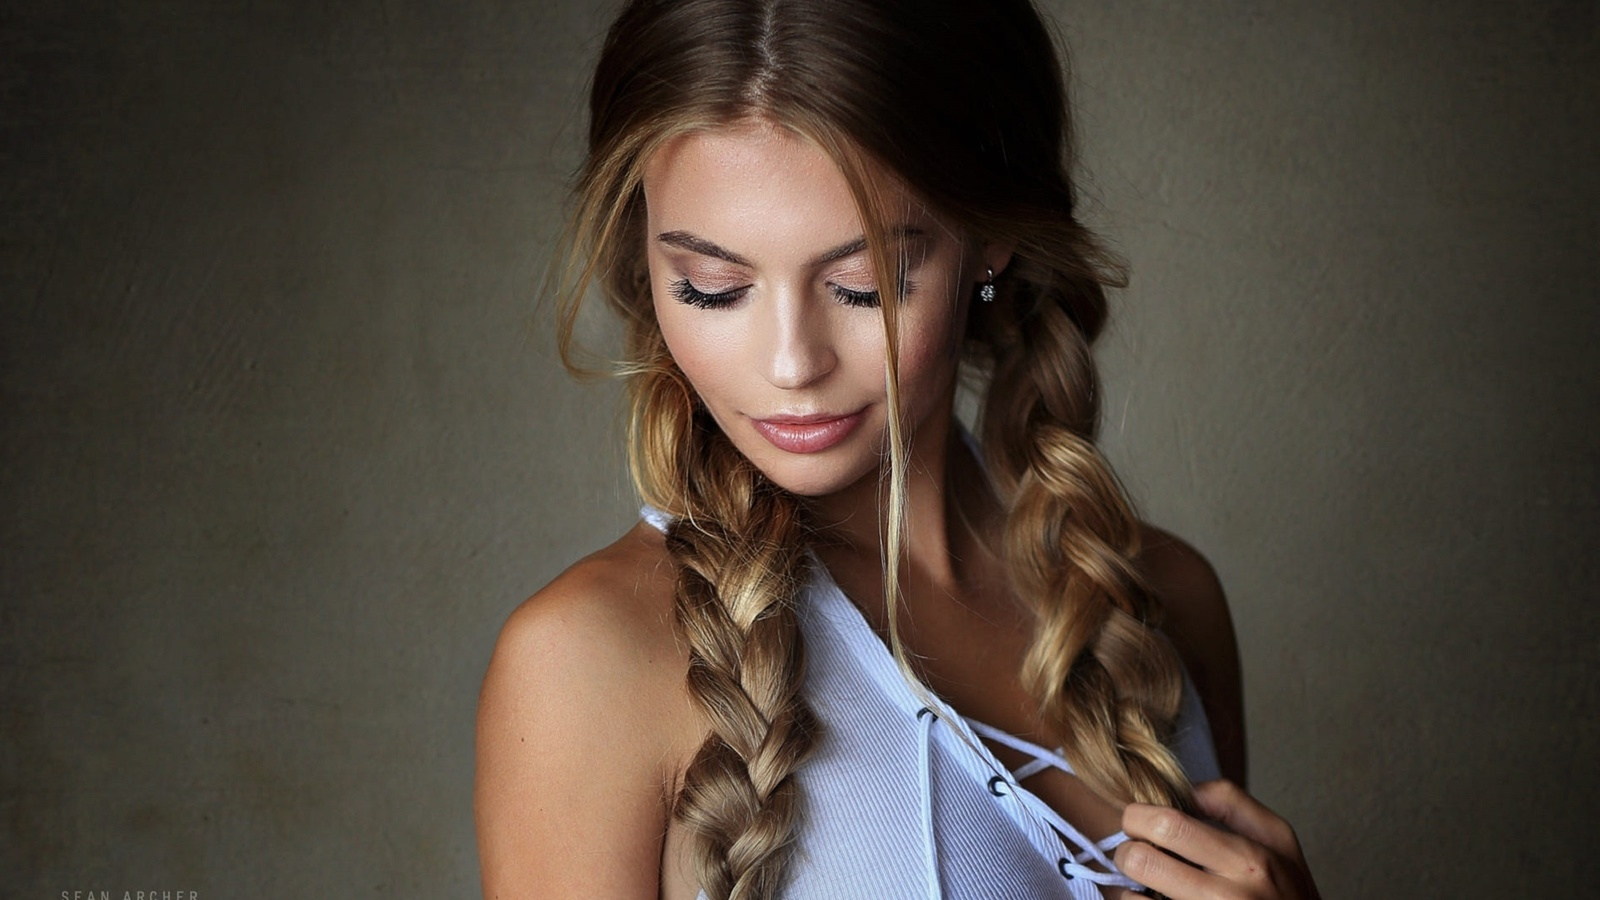 модель юлия, фотограф sean archer, косы, шнуровка, sean archer, katya kotaro